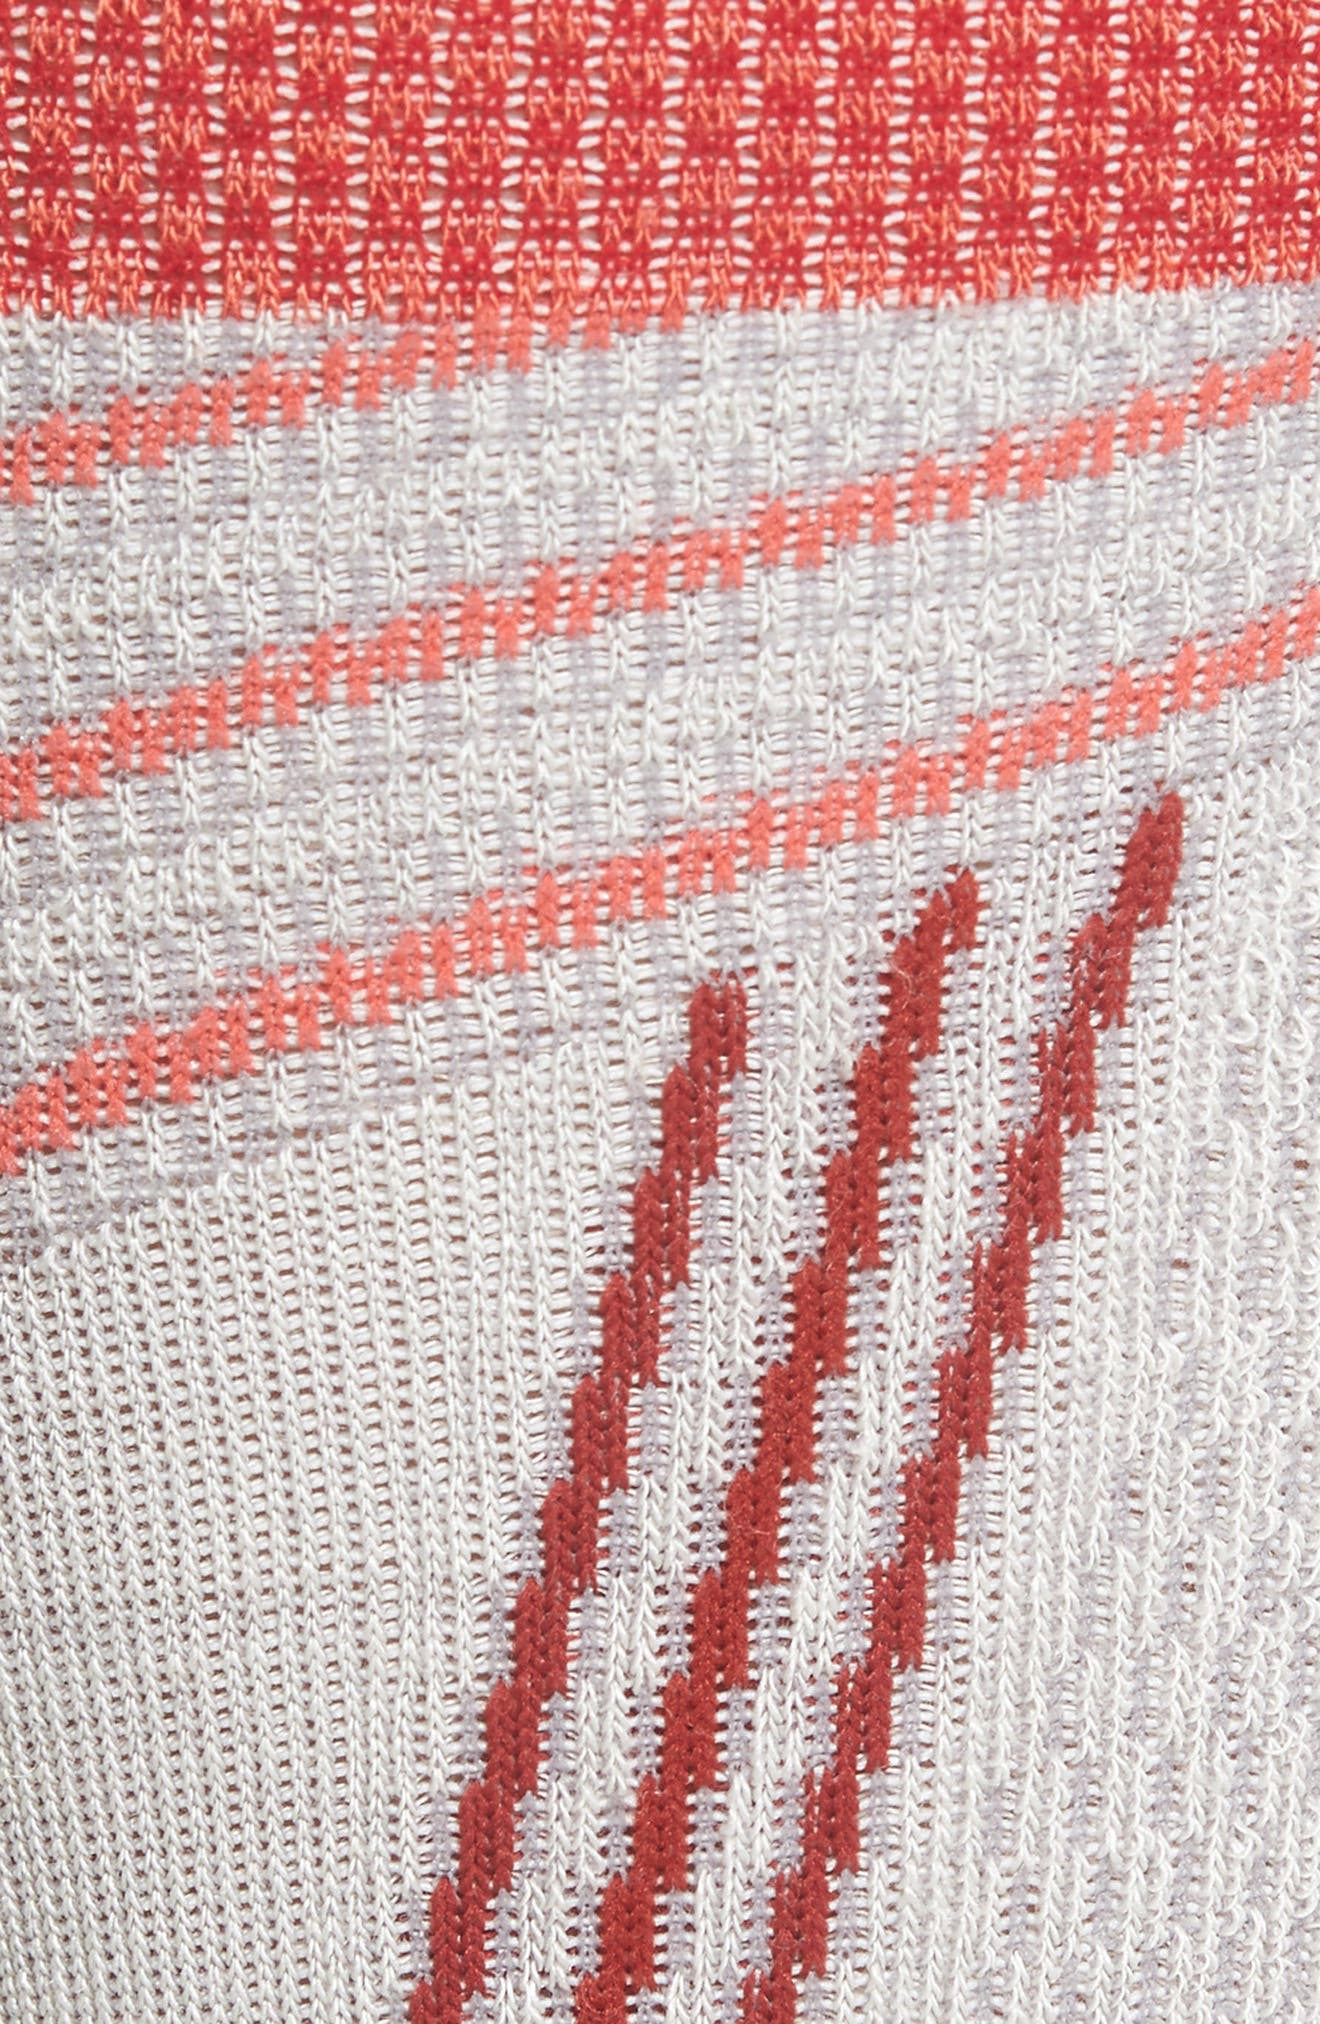 Ski Alpine Racer Compression Knee Socks,                             Alternate thumbnail 4, color,